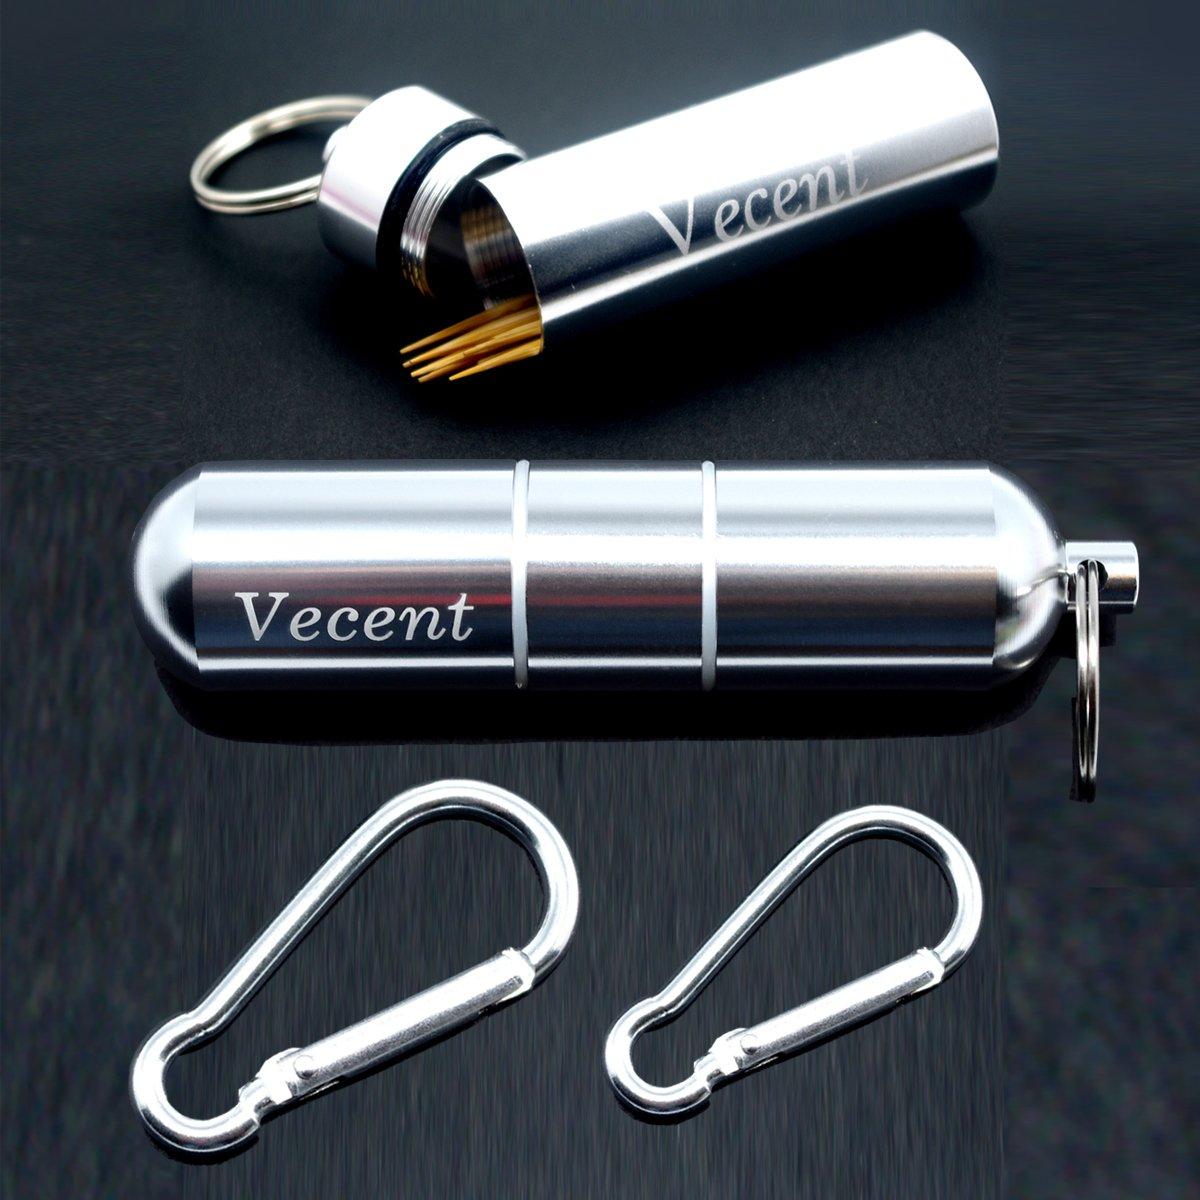 Vecent Portable Toothpick Holder All Purpose Mini box Waterproof Toothpick Box Pocket Metal Pill Case Key chain Cotton Swab Box Earphone box (3 IN) COMIN18JU078295